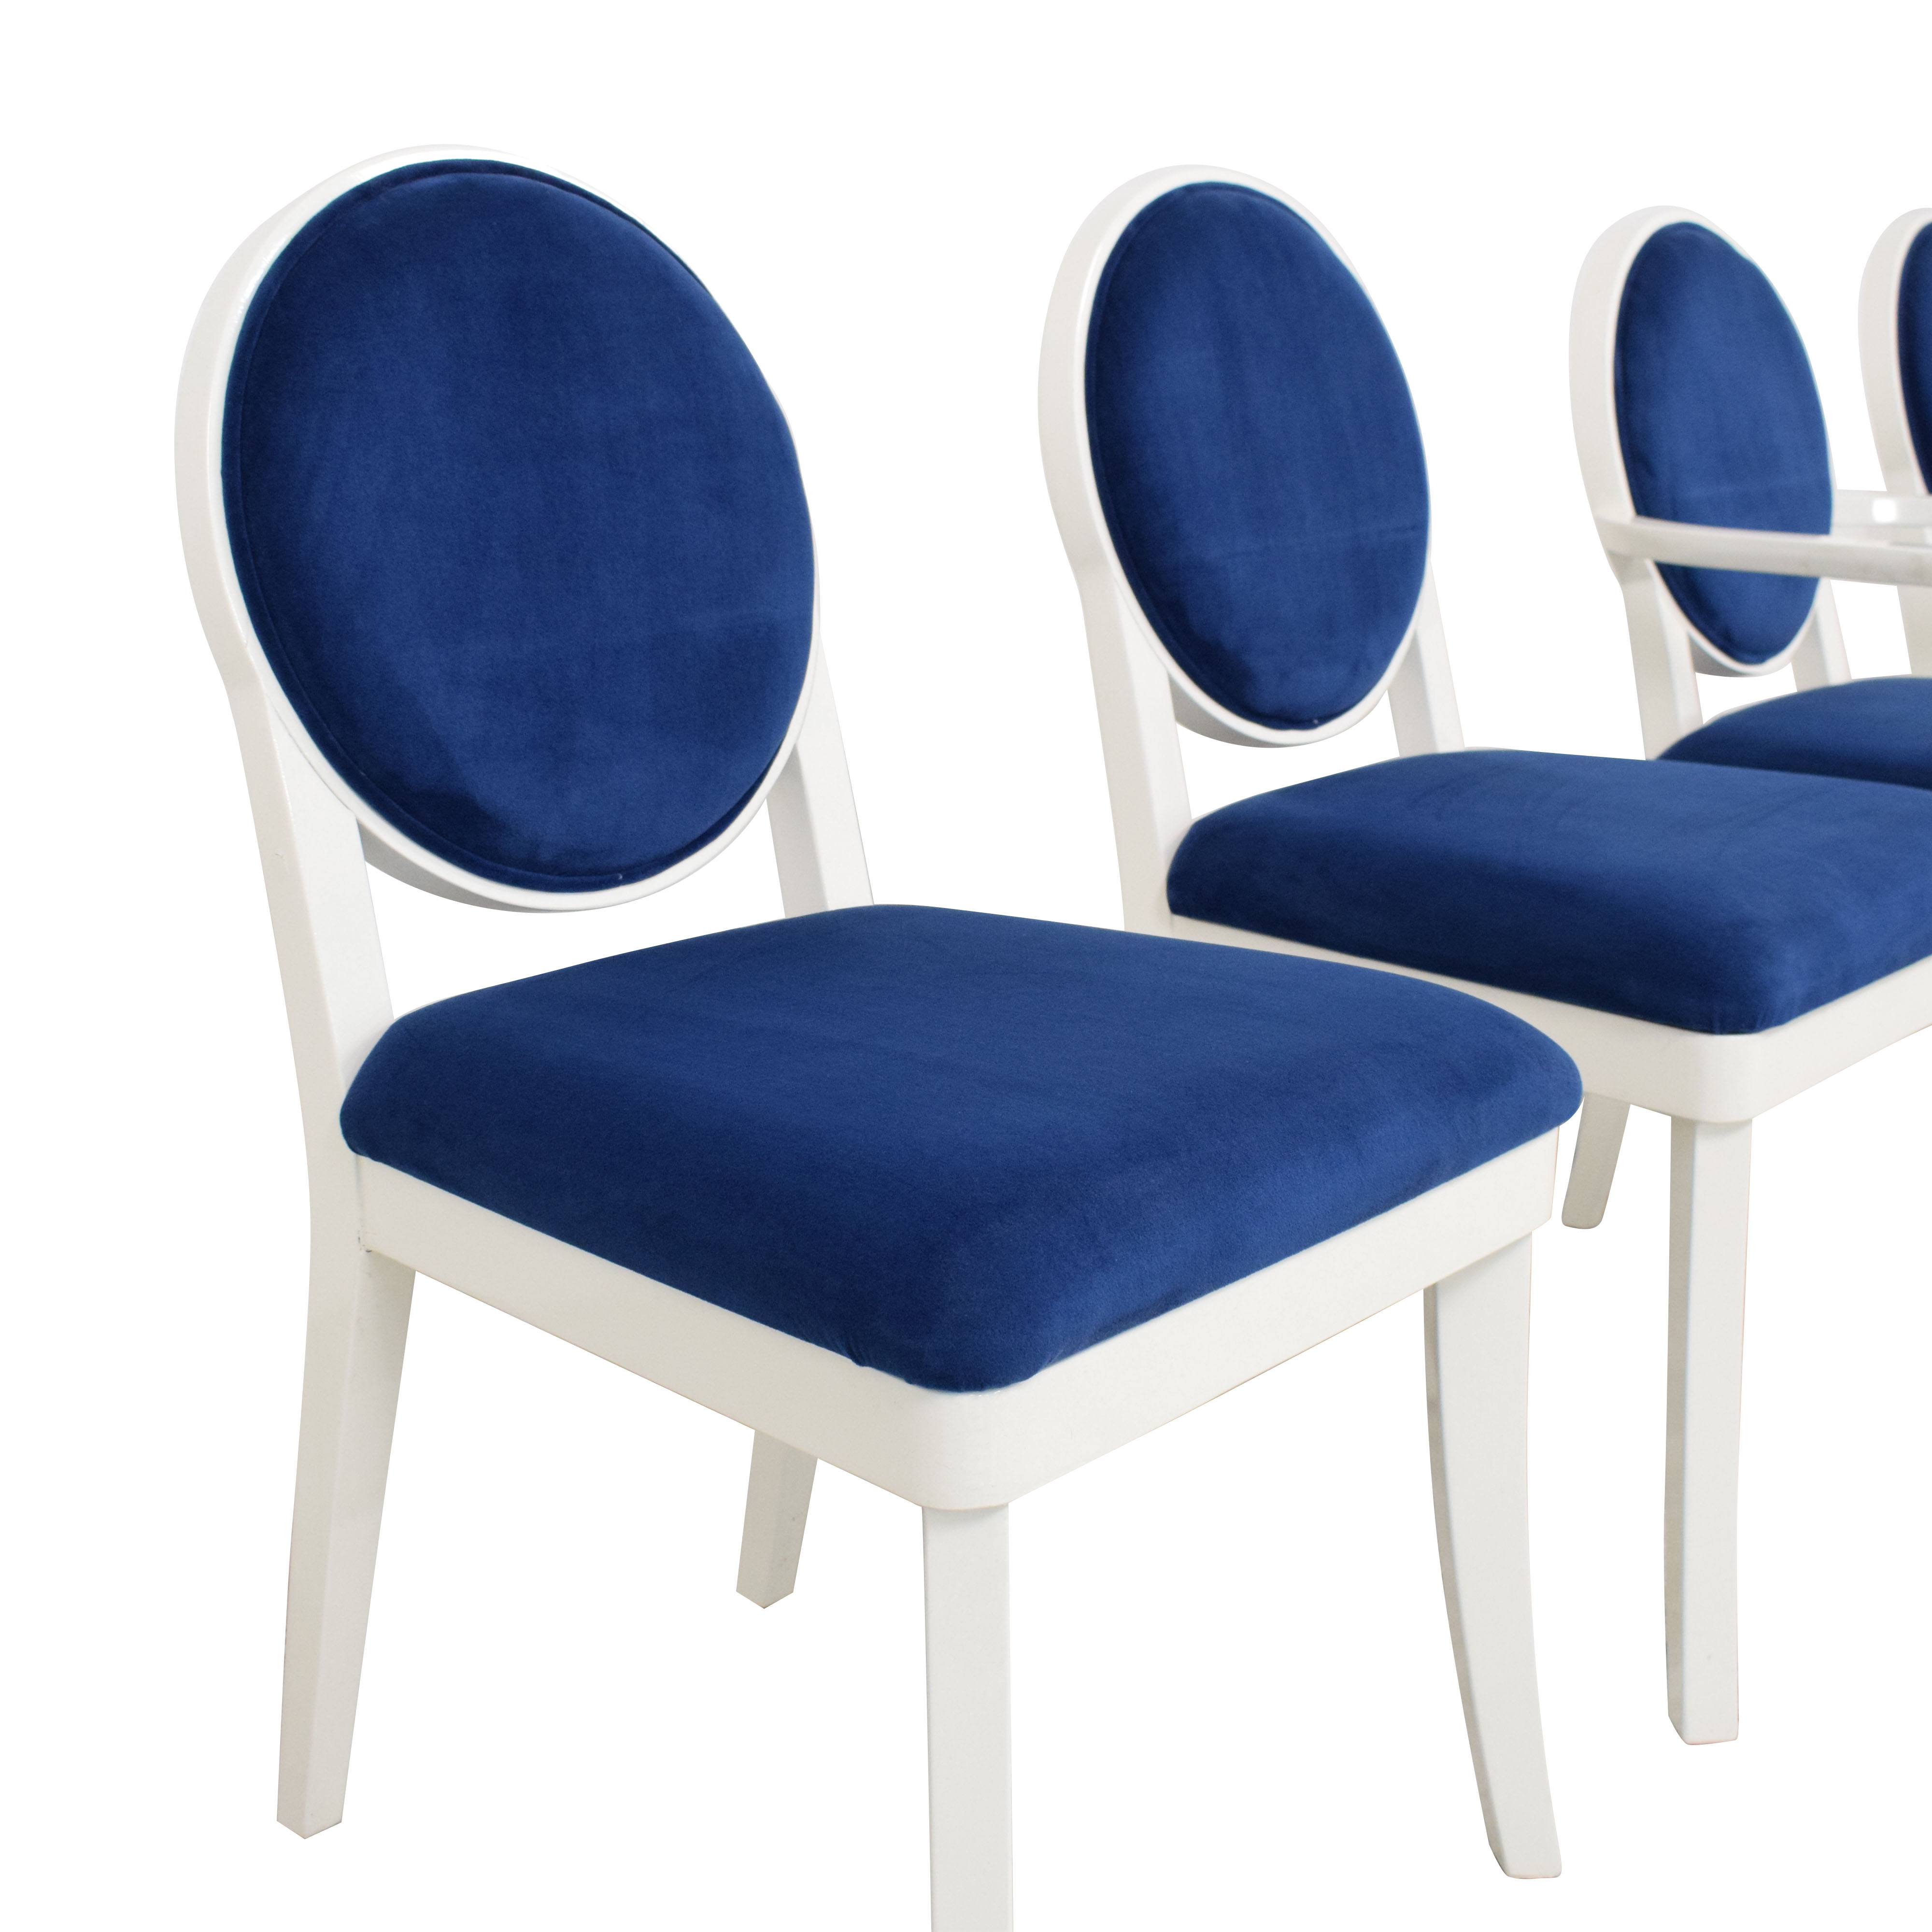 Jonathan Adler Jonathan Adler Happy Chic Dining Chairs on sale